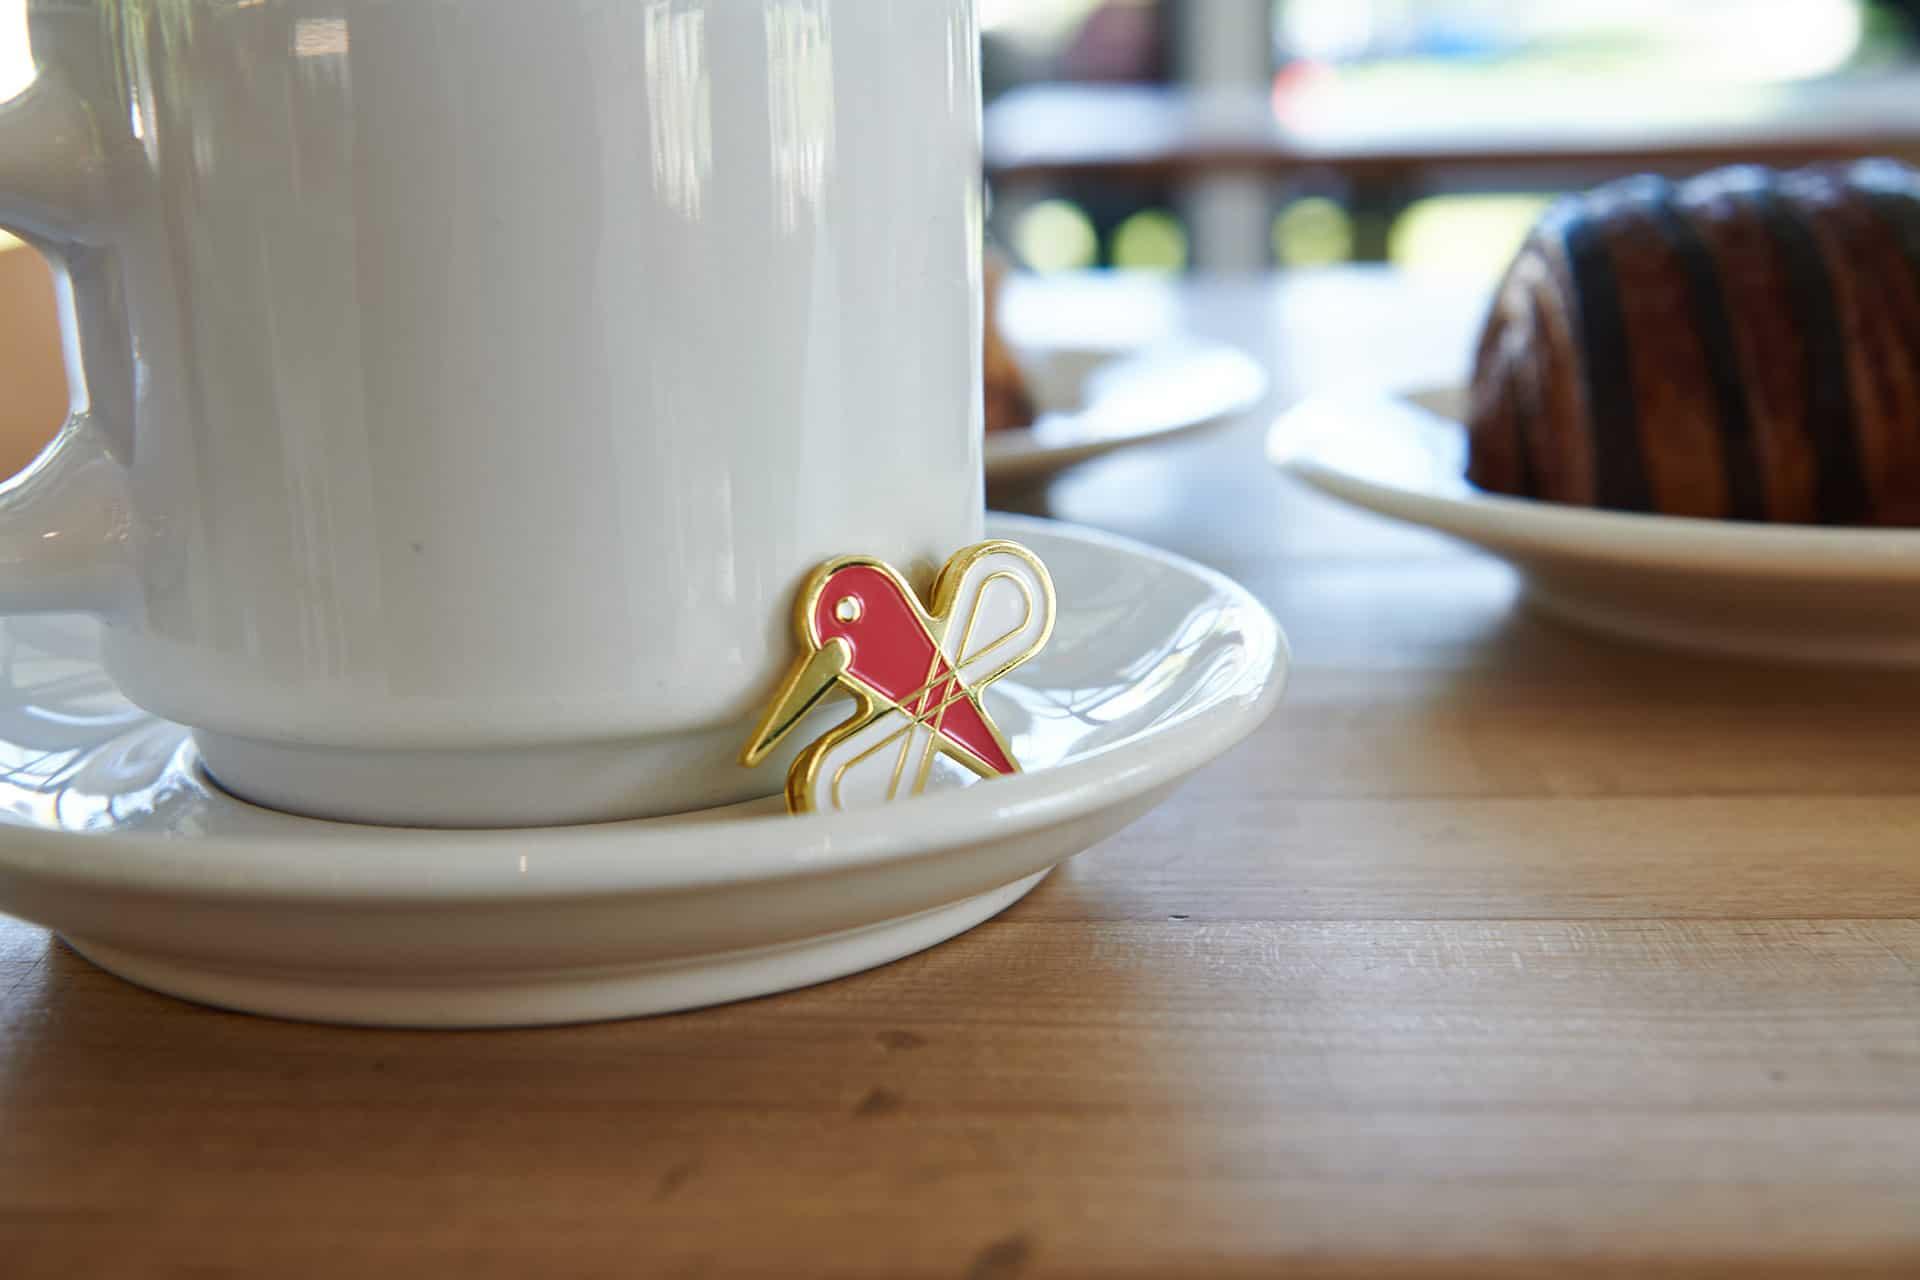 Zinnia bakery and cafe branding enamel pin